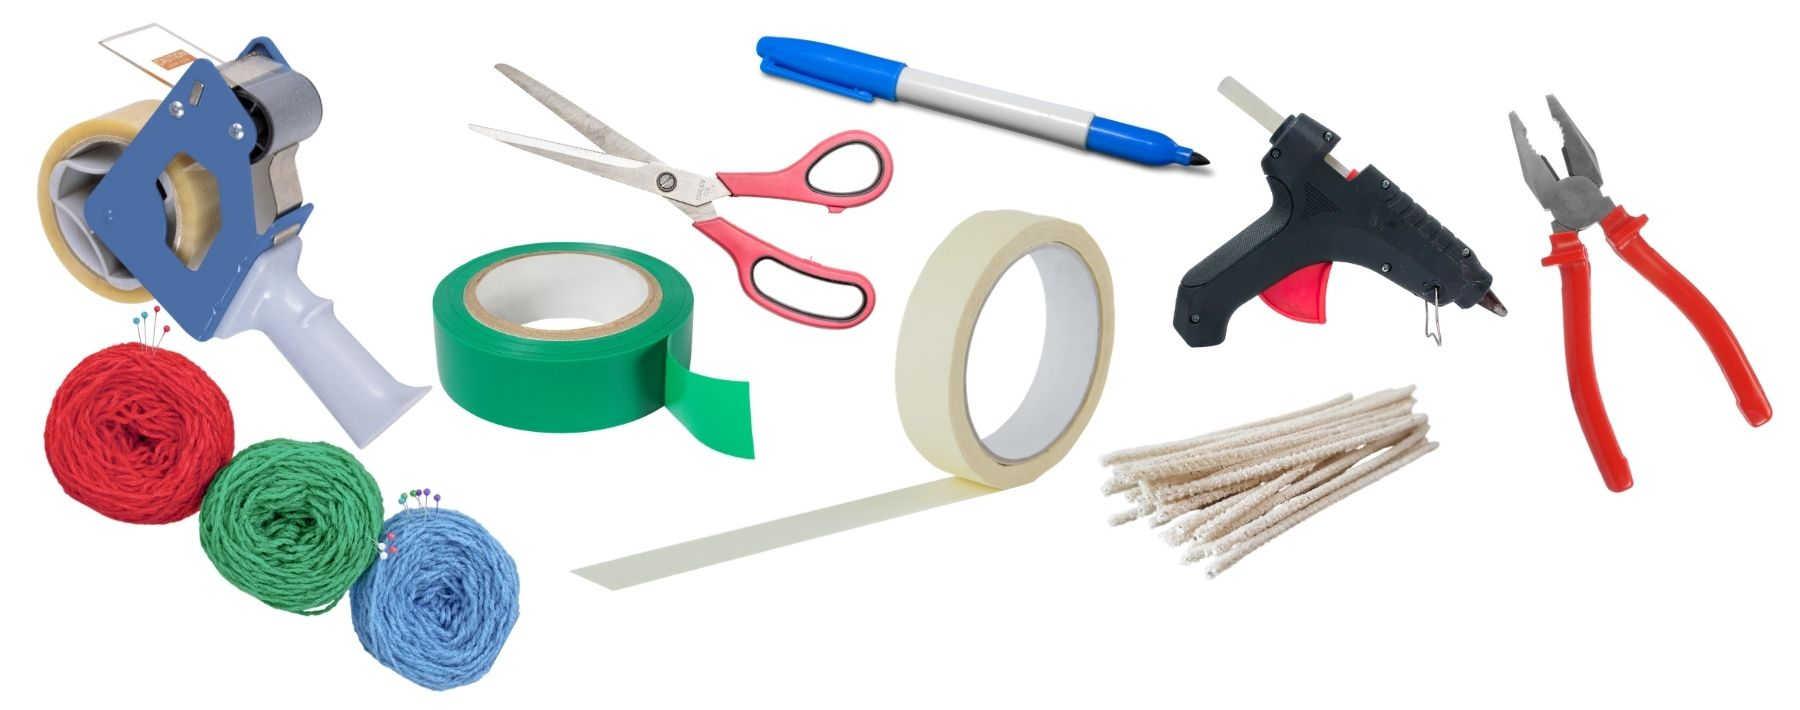 Tips for a DIY wedding - supplies kit